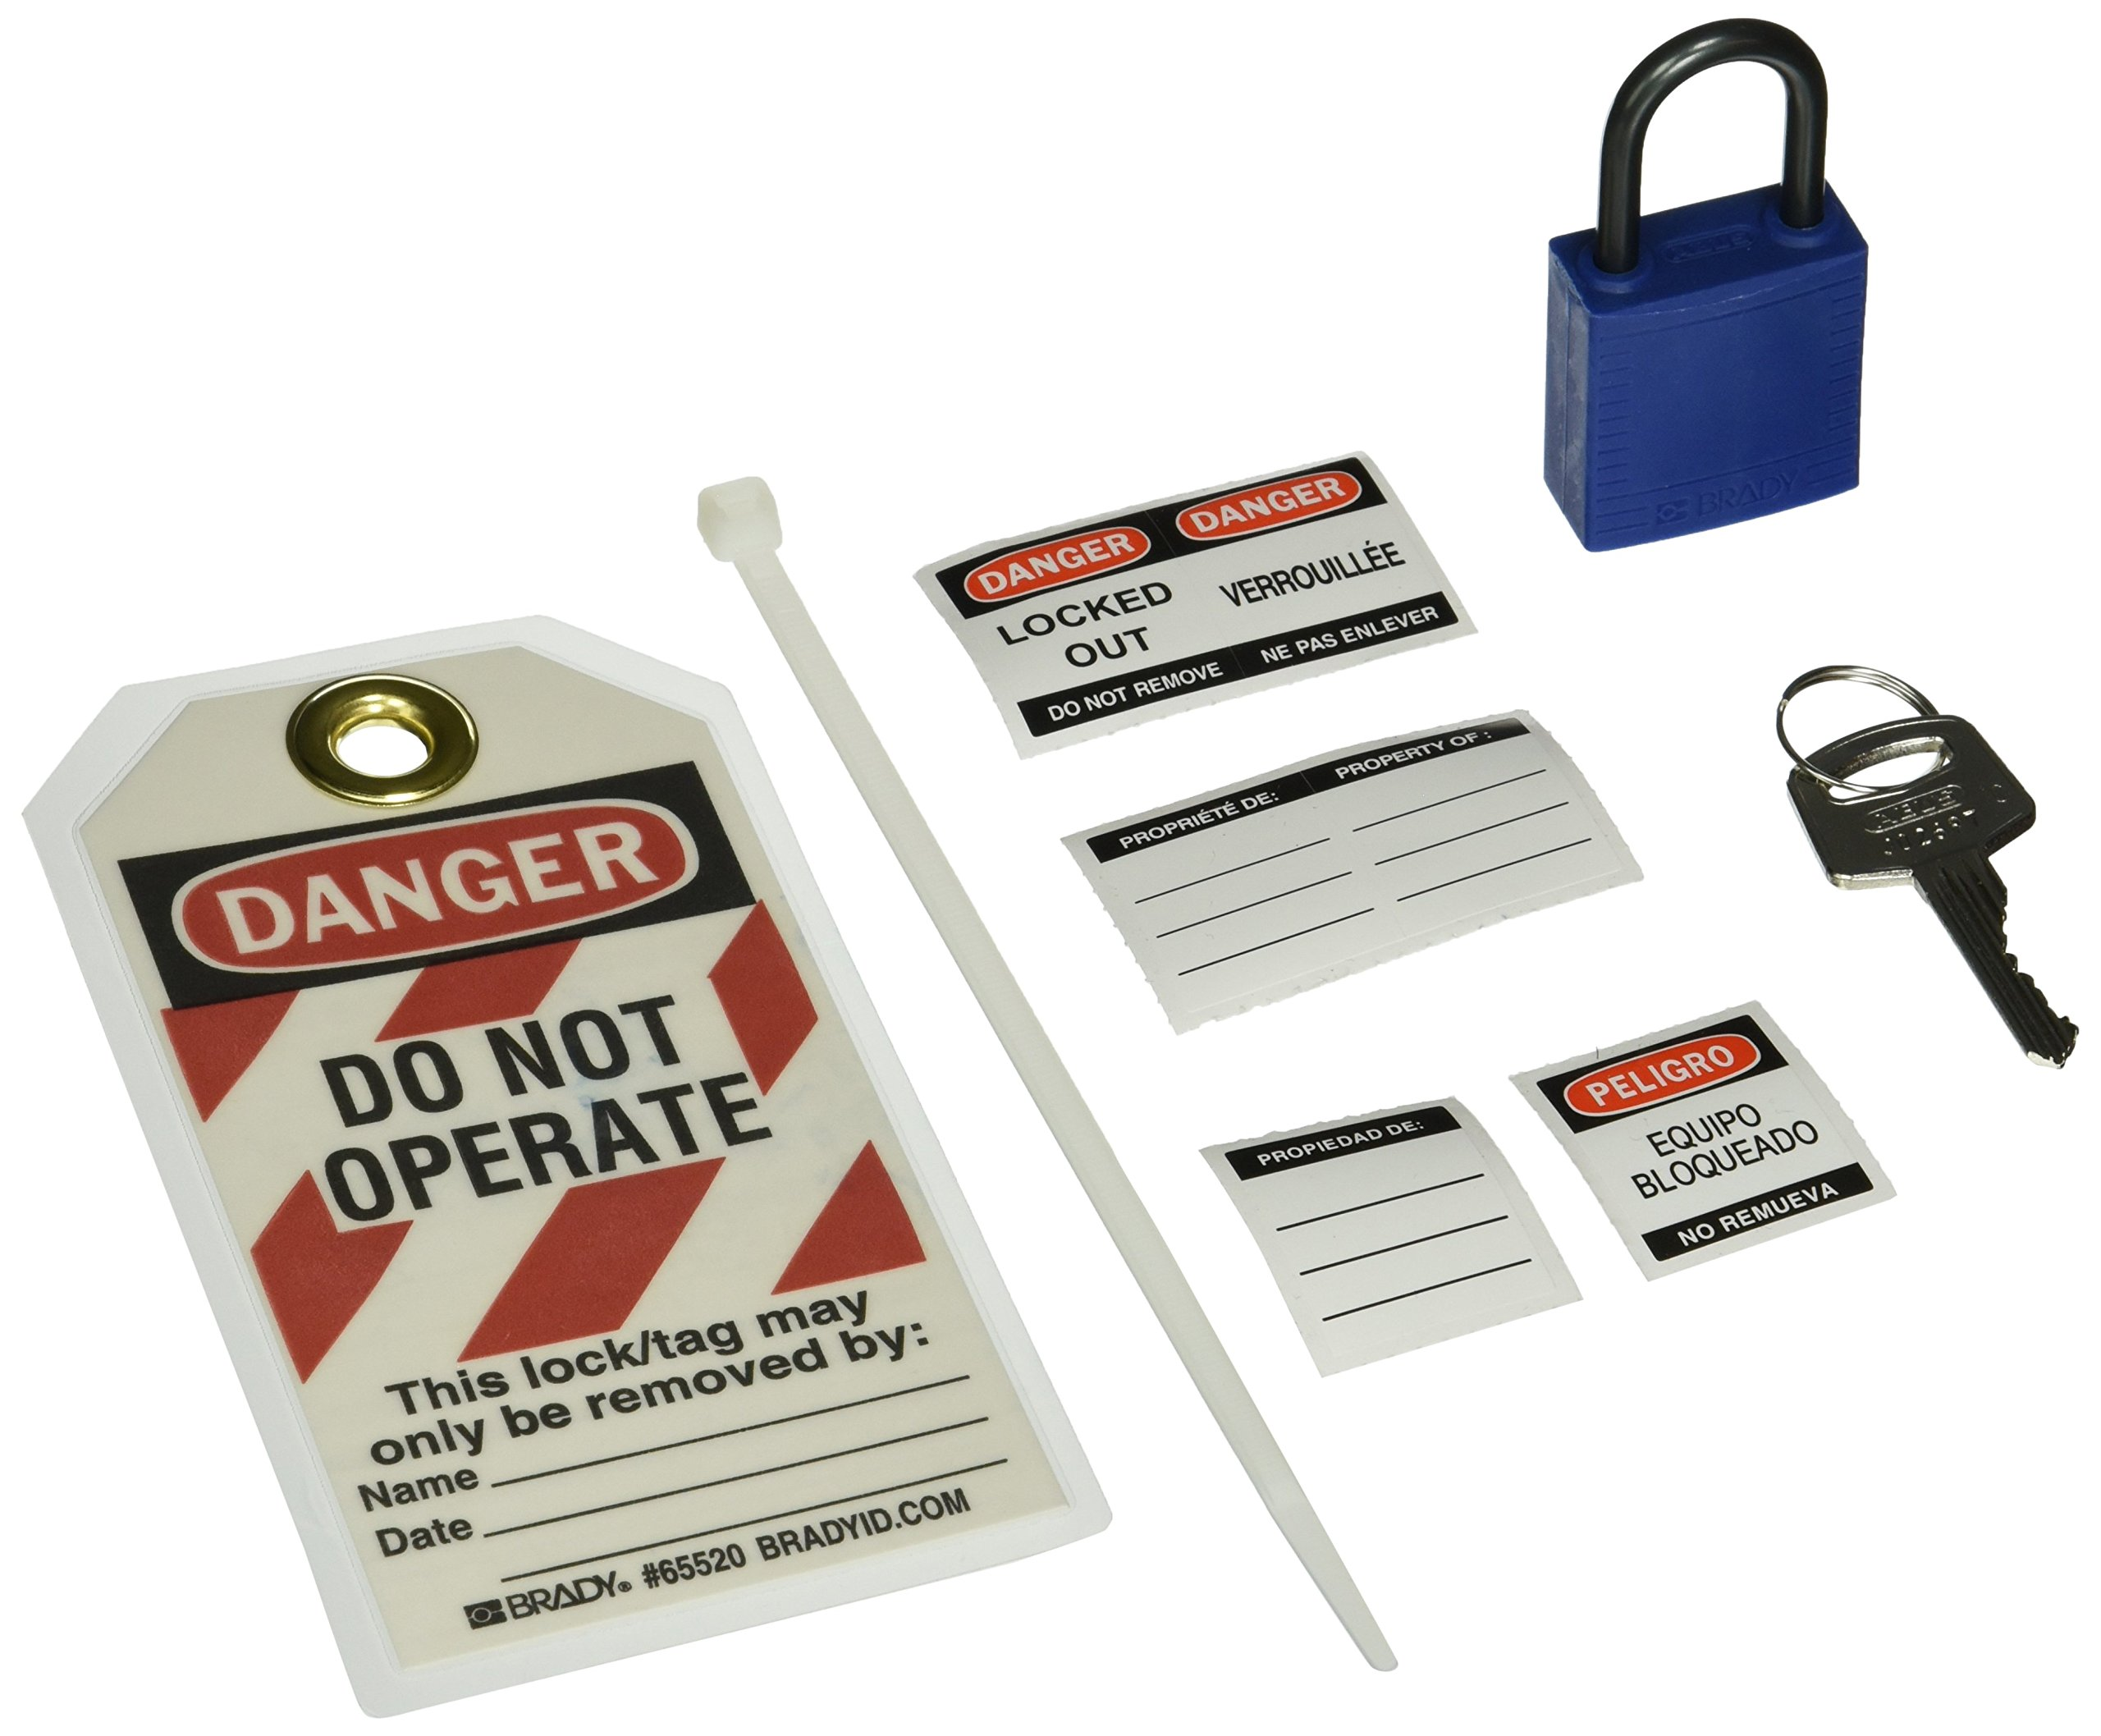 Brady 123146 Compact Lock Personal Kit, Blue